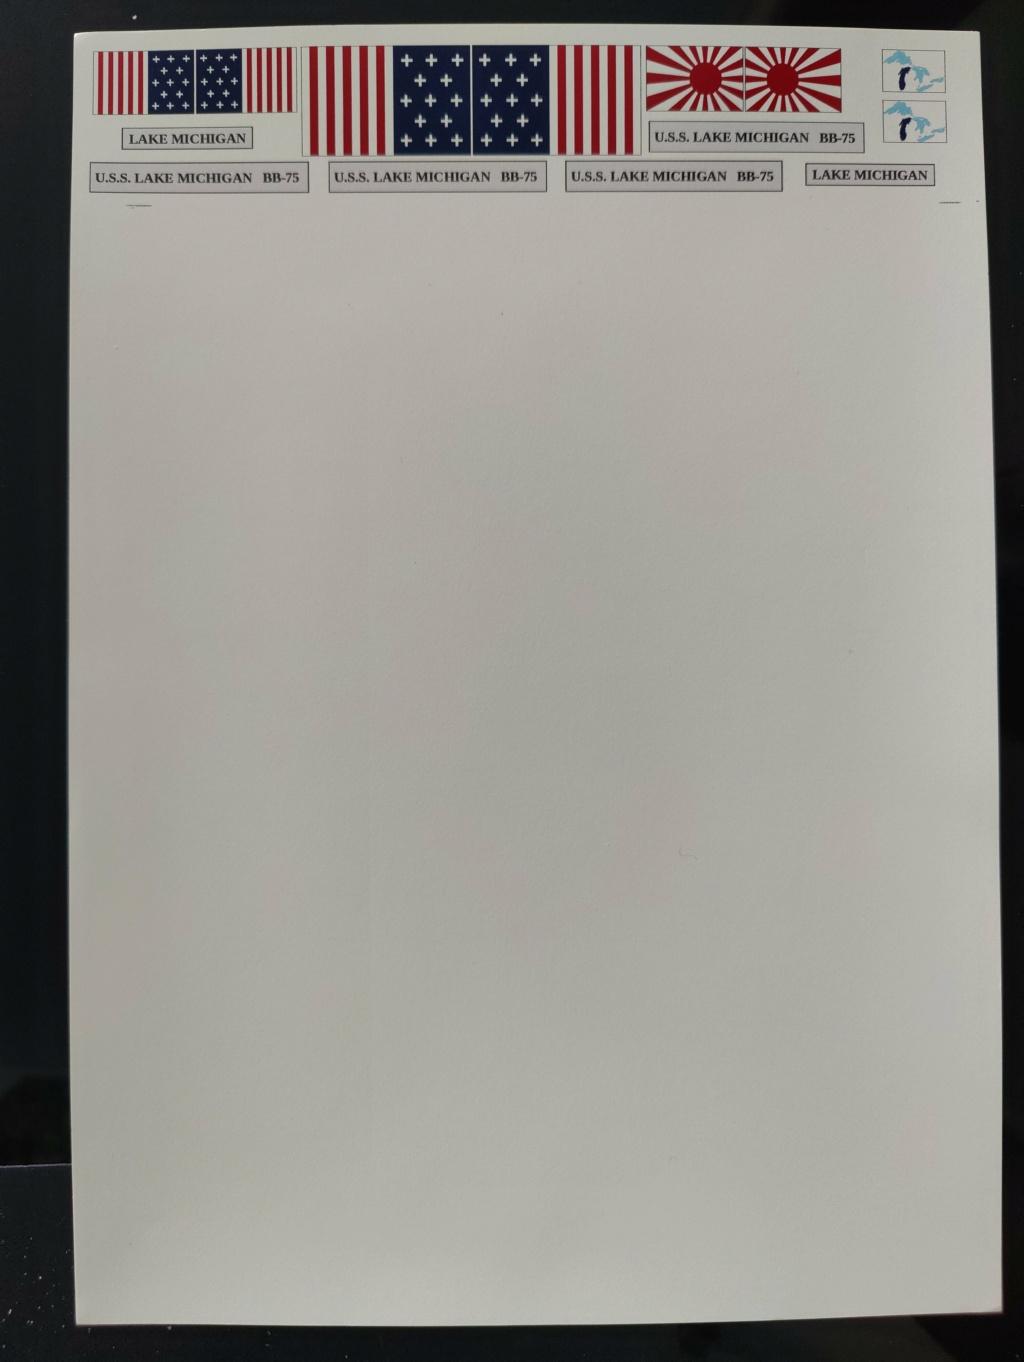 [Uchronie] USS Lake Michigan (base Iowa Trumpeter 1/200°) par hibikitokay - Page 11 Img_2207